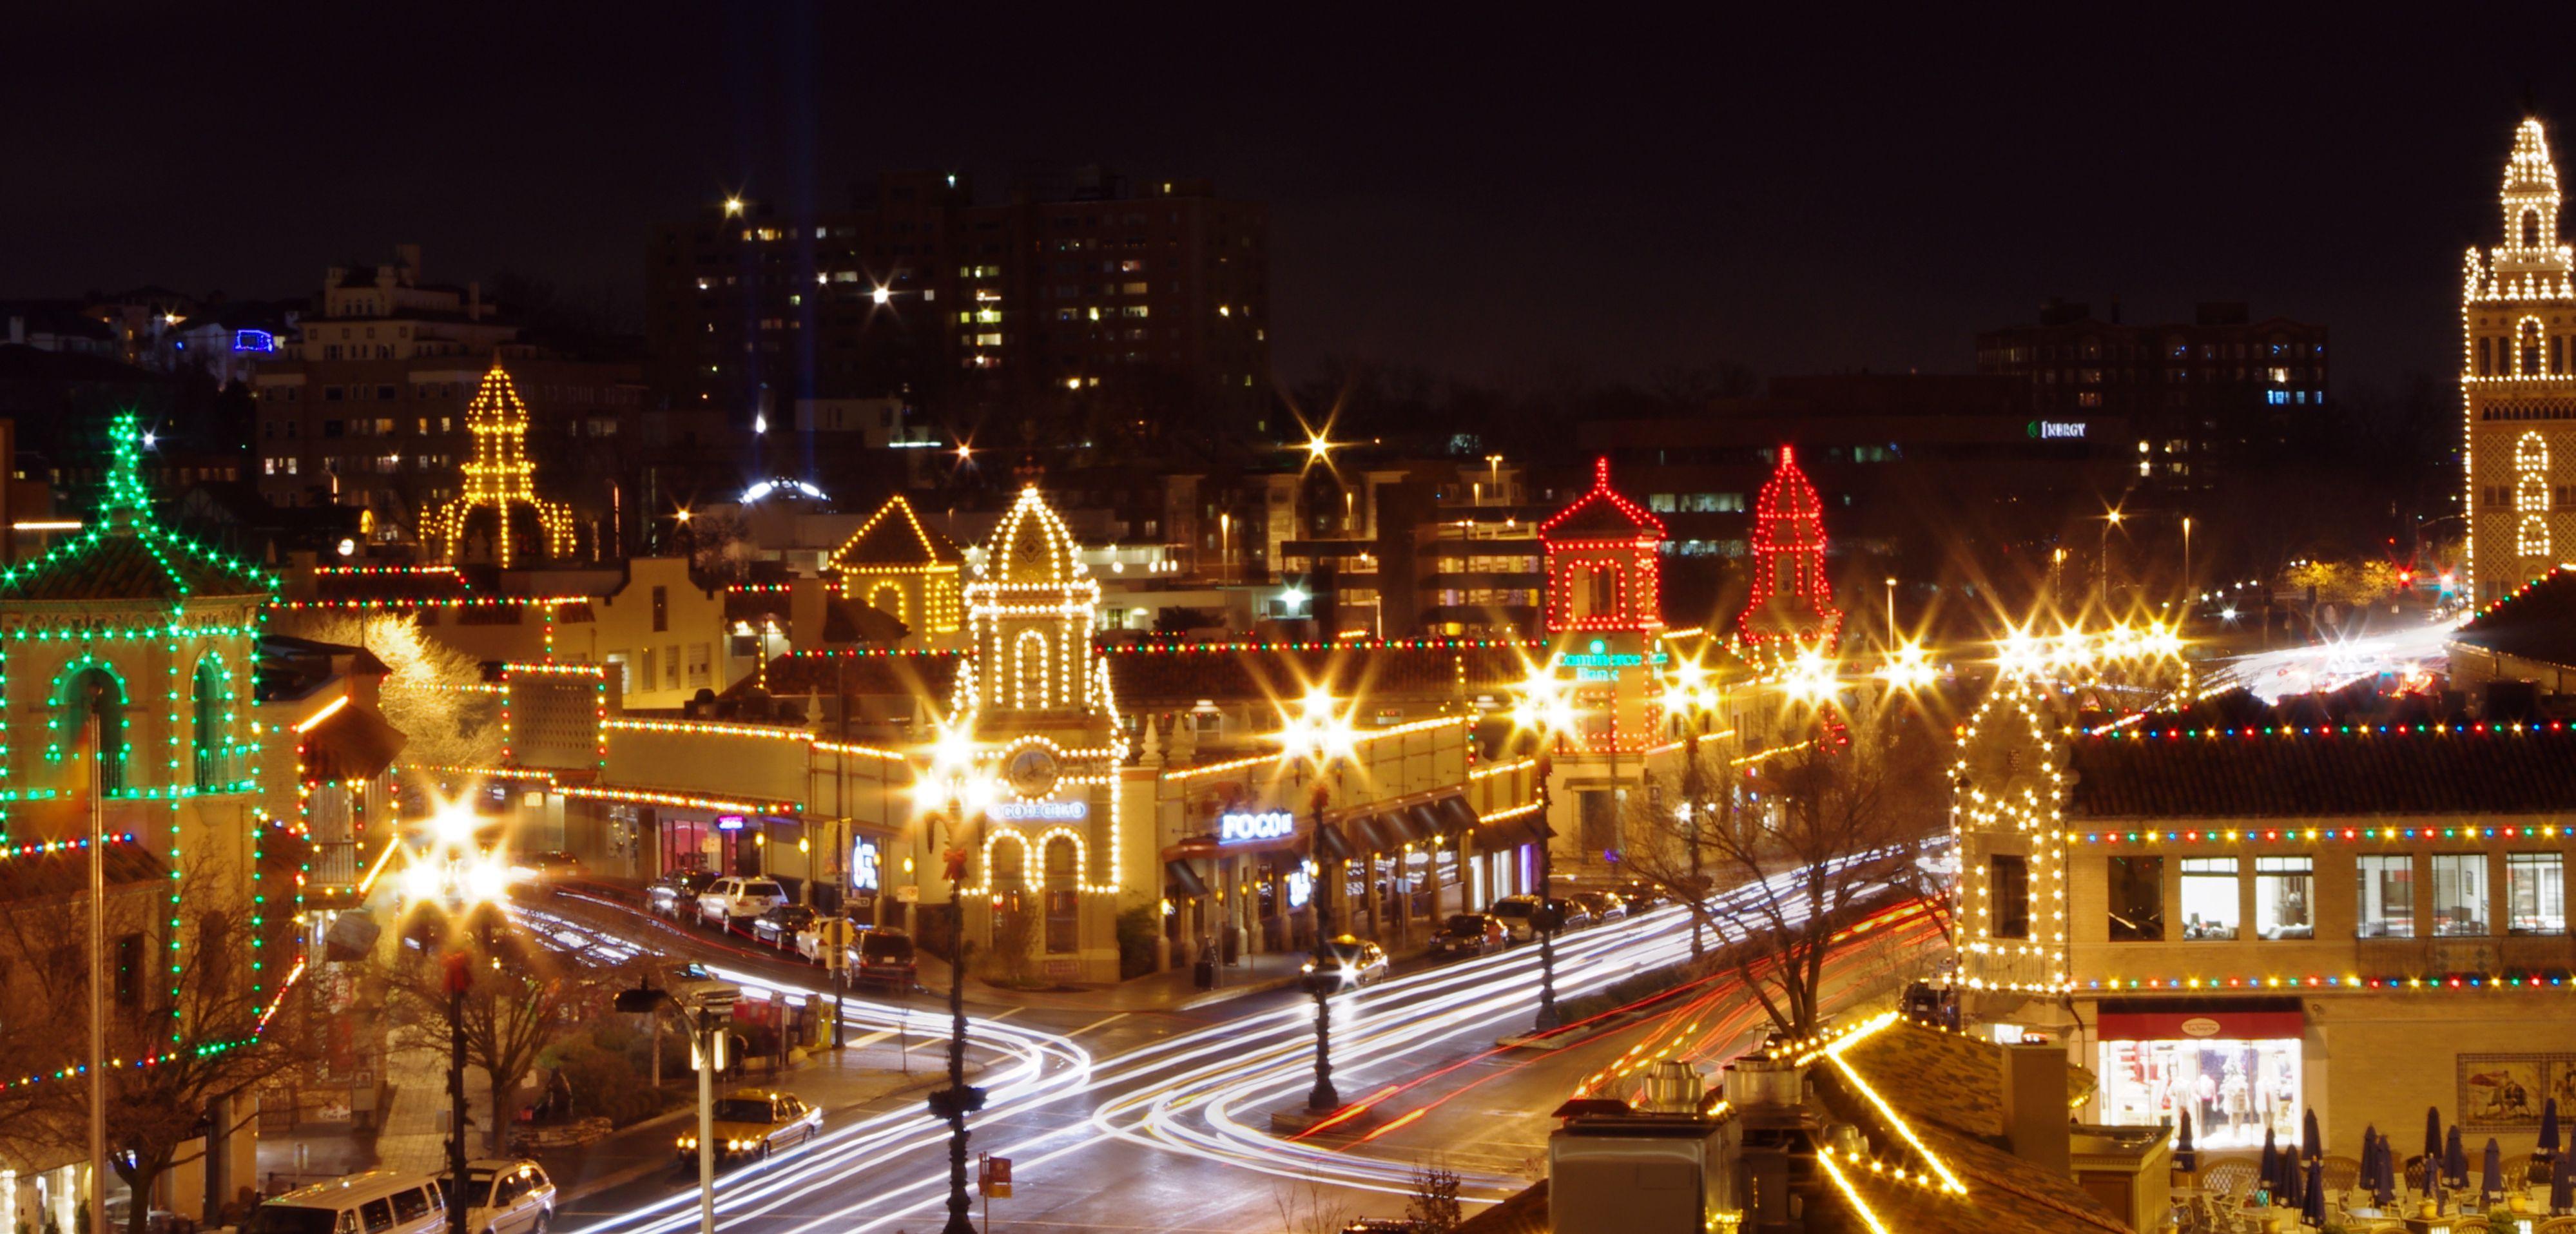 kansas city plaza Kansas city plaza